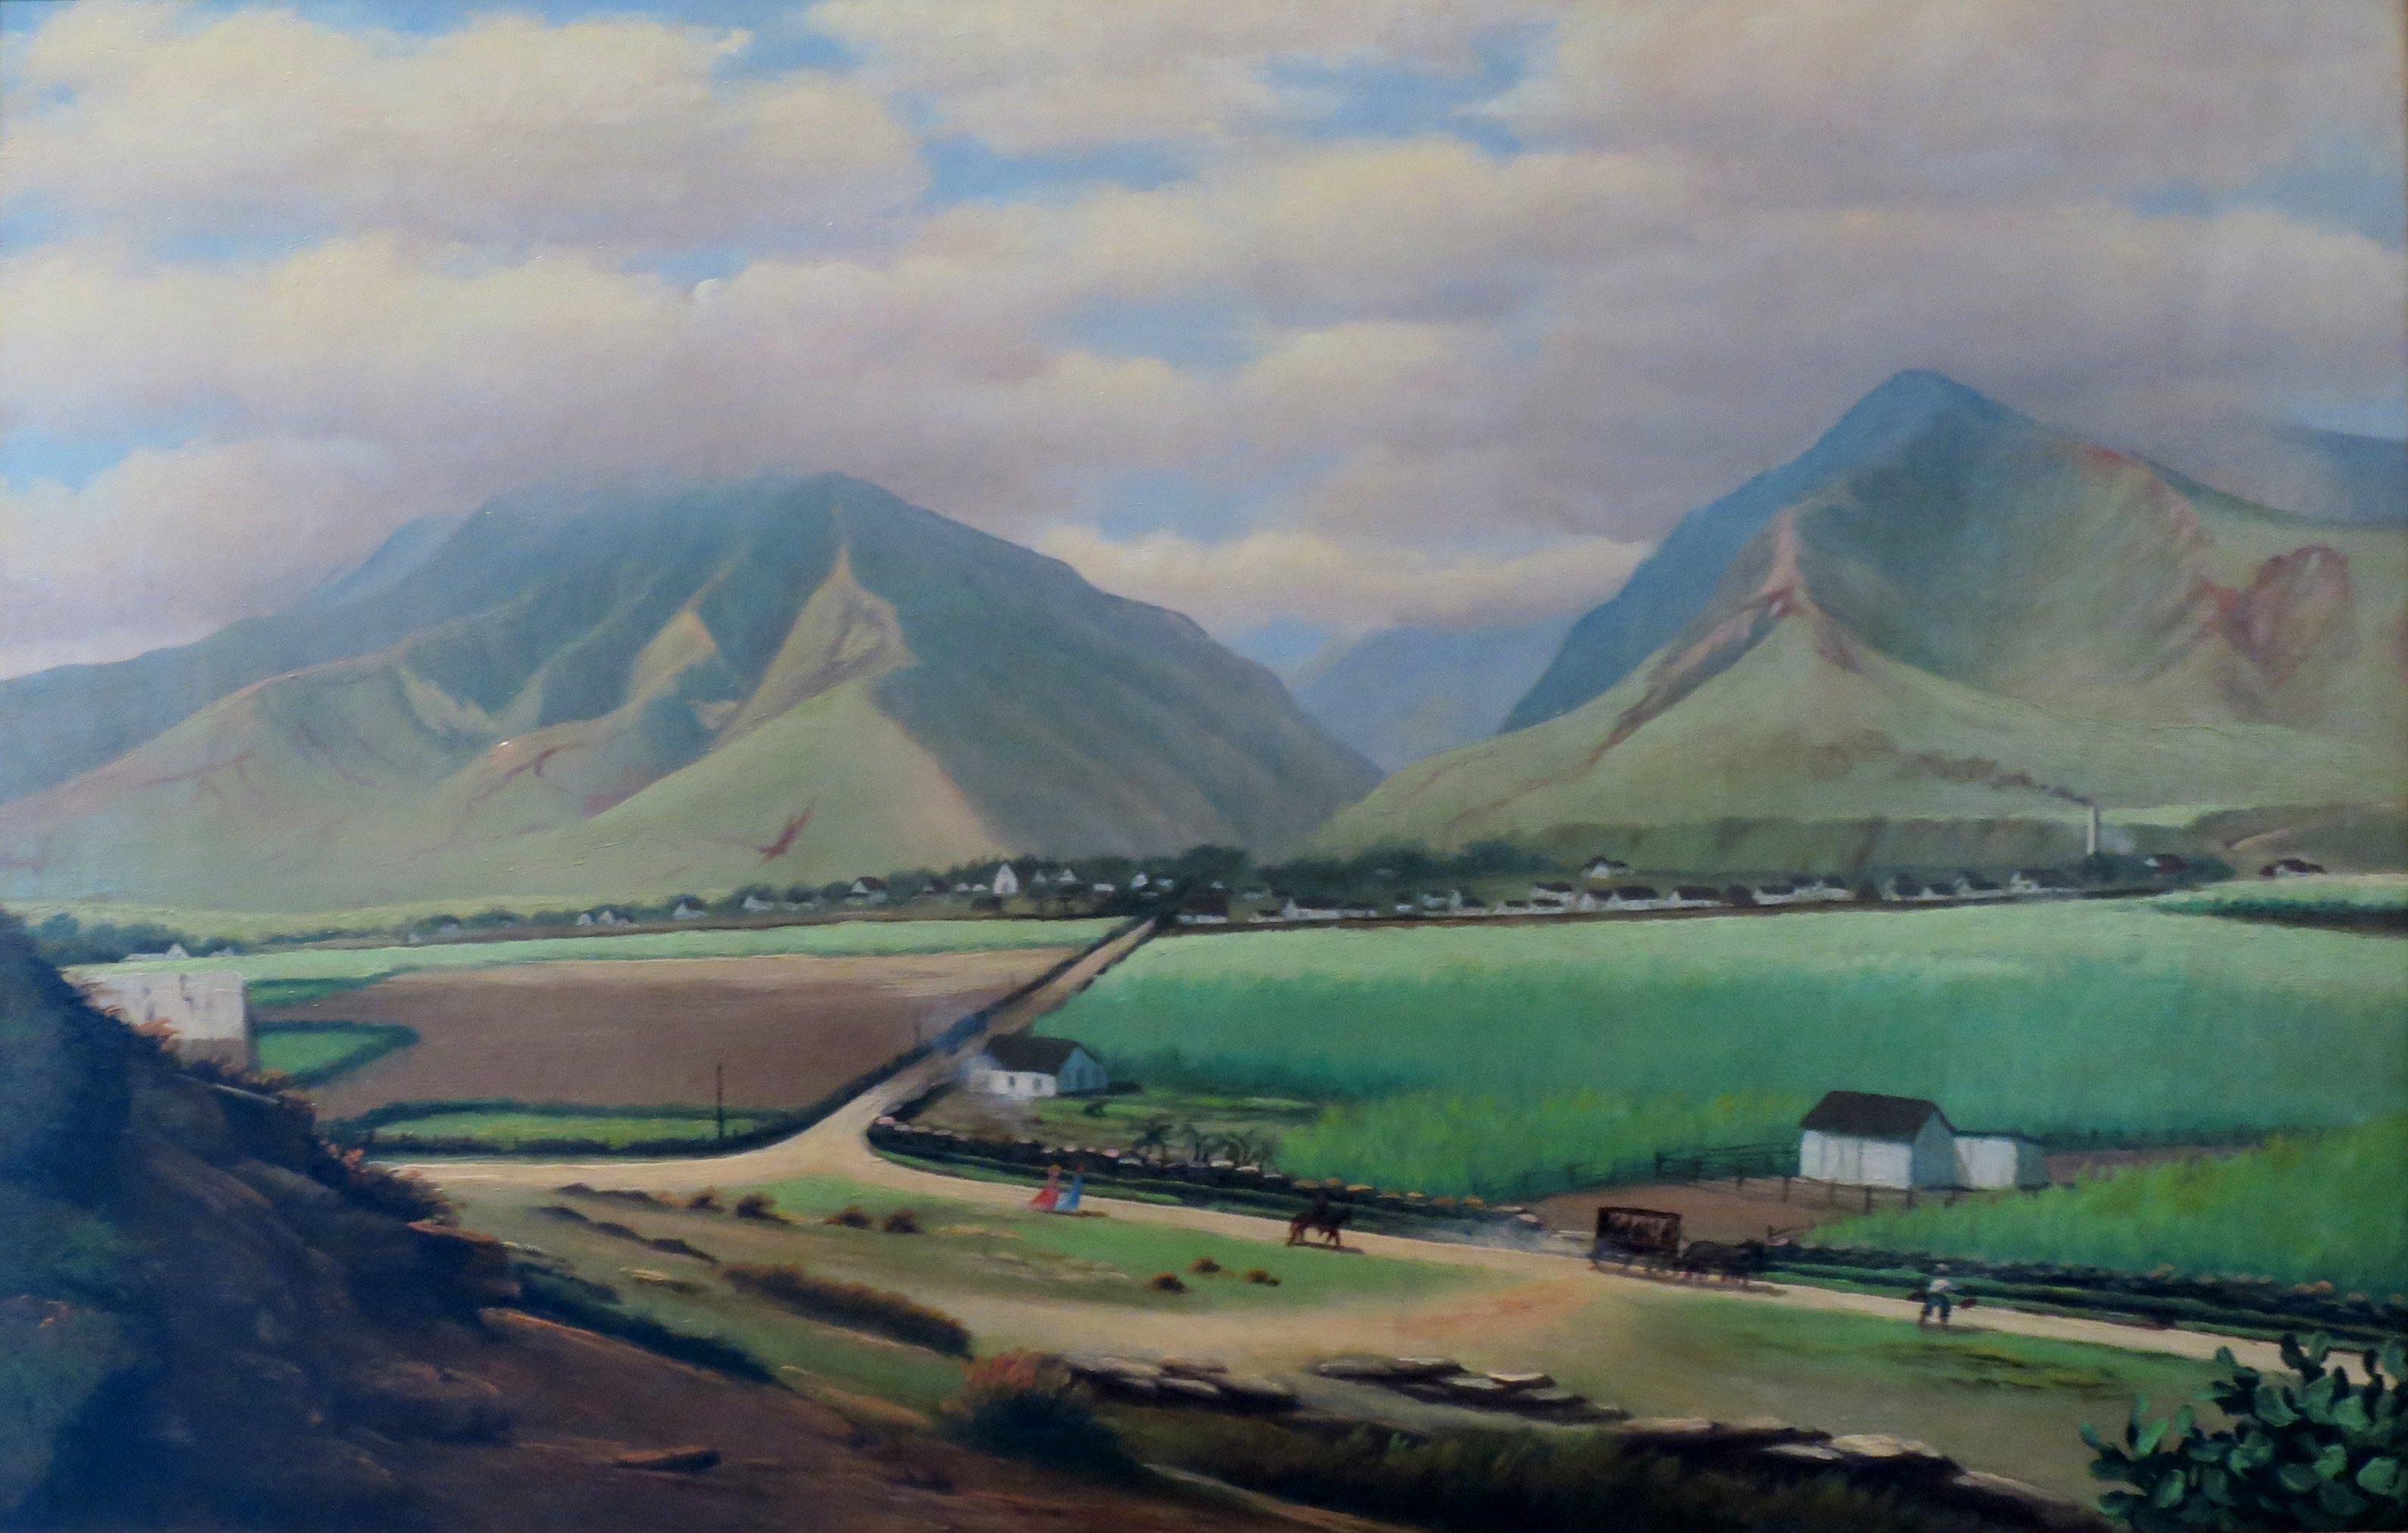 File:Edward Bailey painting of Wailuku and Iao Valley.jpg ... Wailuku